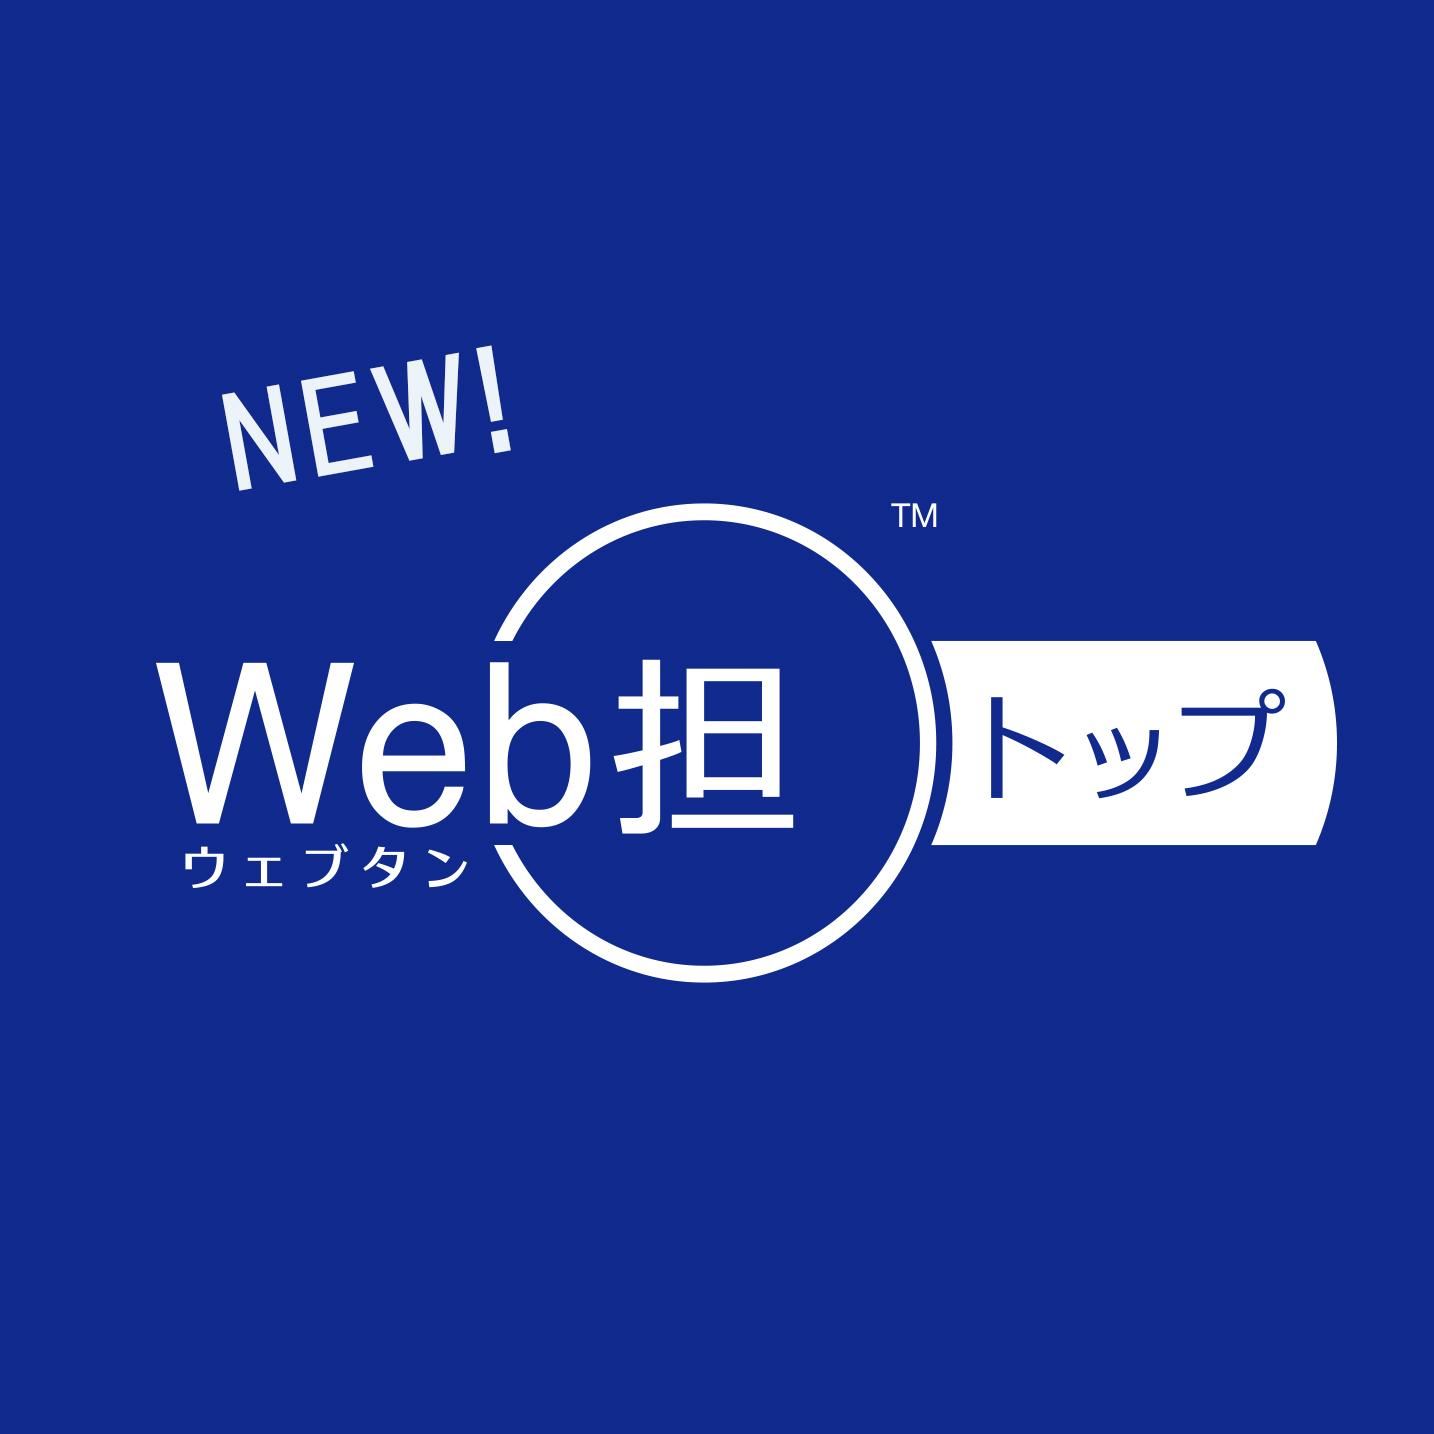 No.0037 |【経営陣が「Web知識」を得た企業は成長する】経営陣がWeb戦略を学ぶための「NEW Web担」始動!!